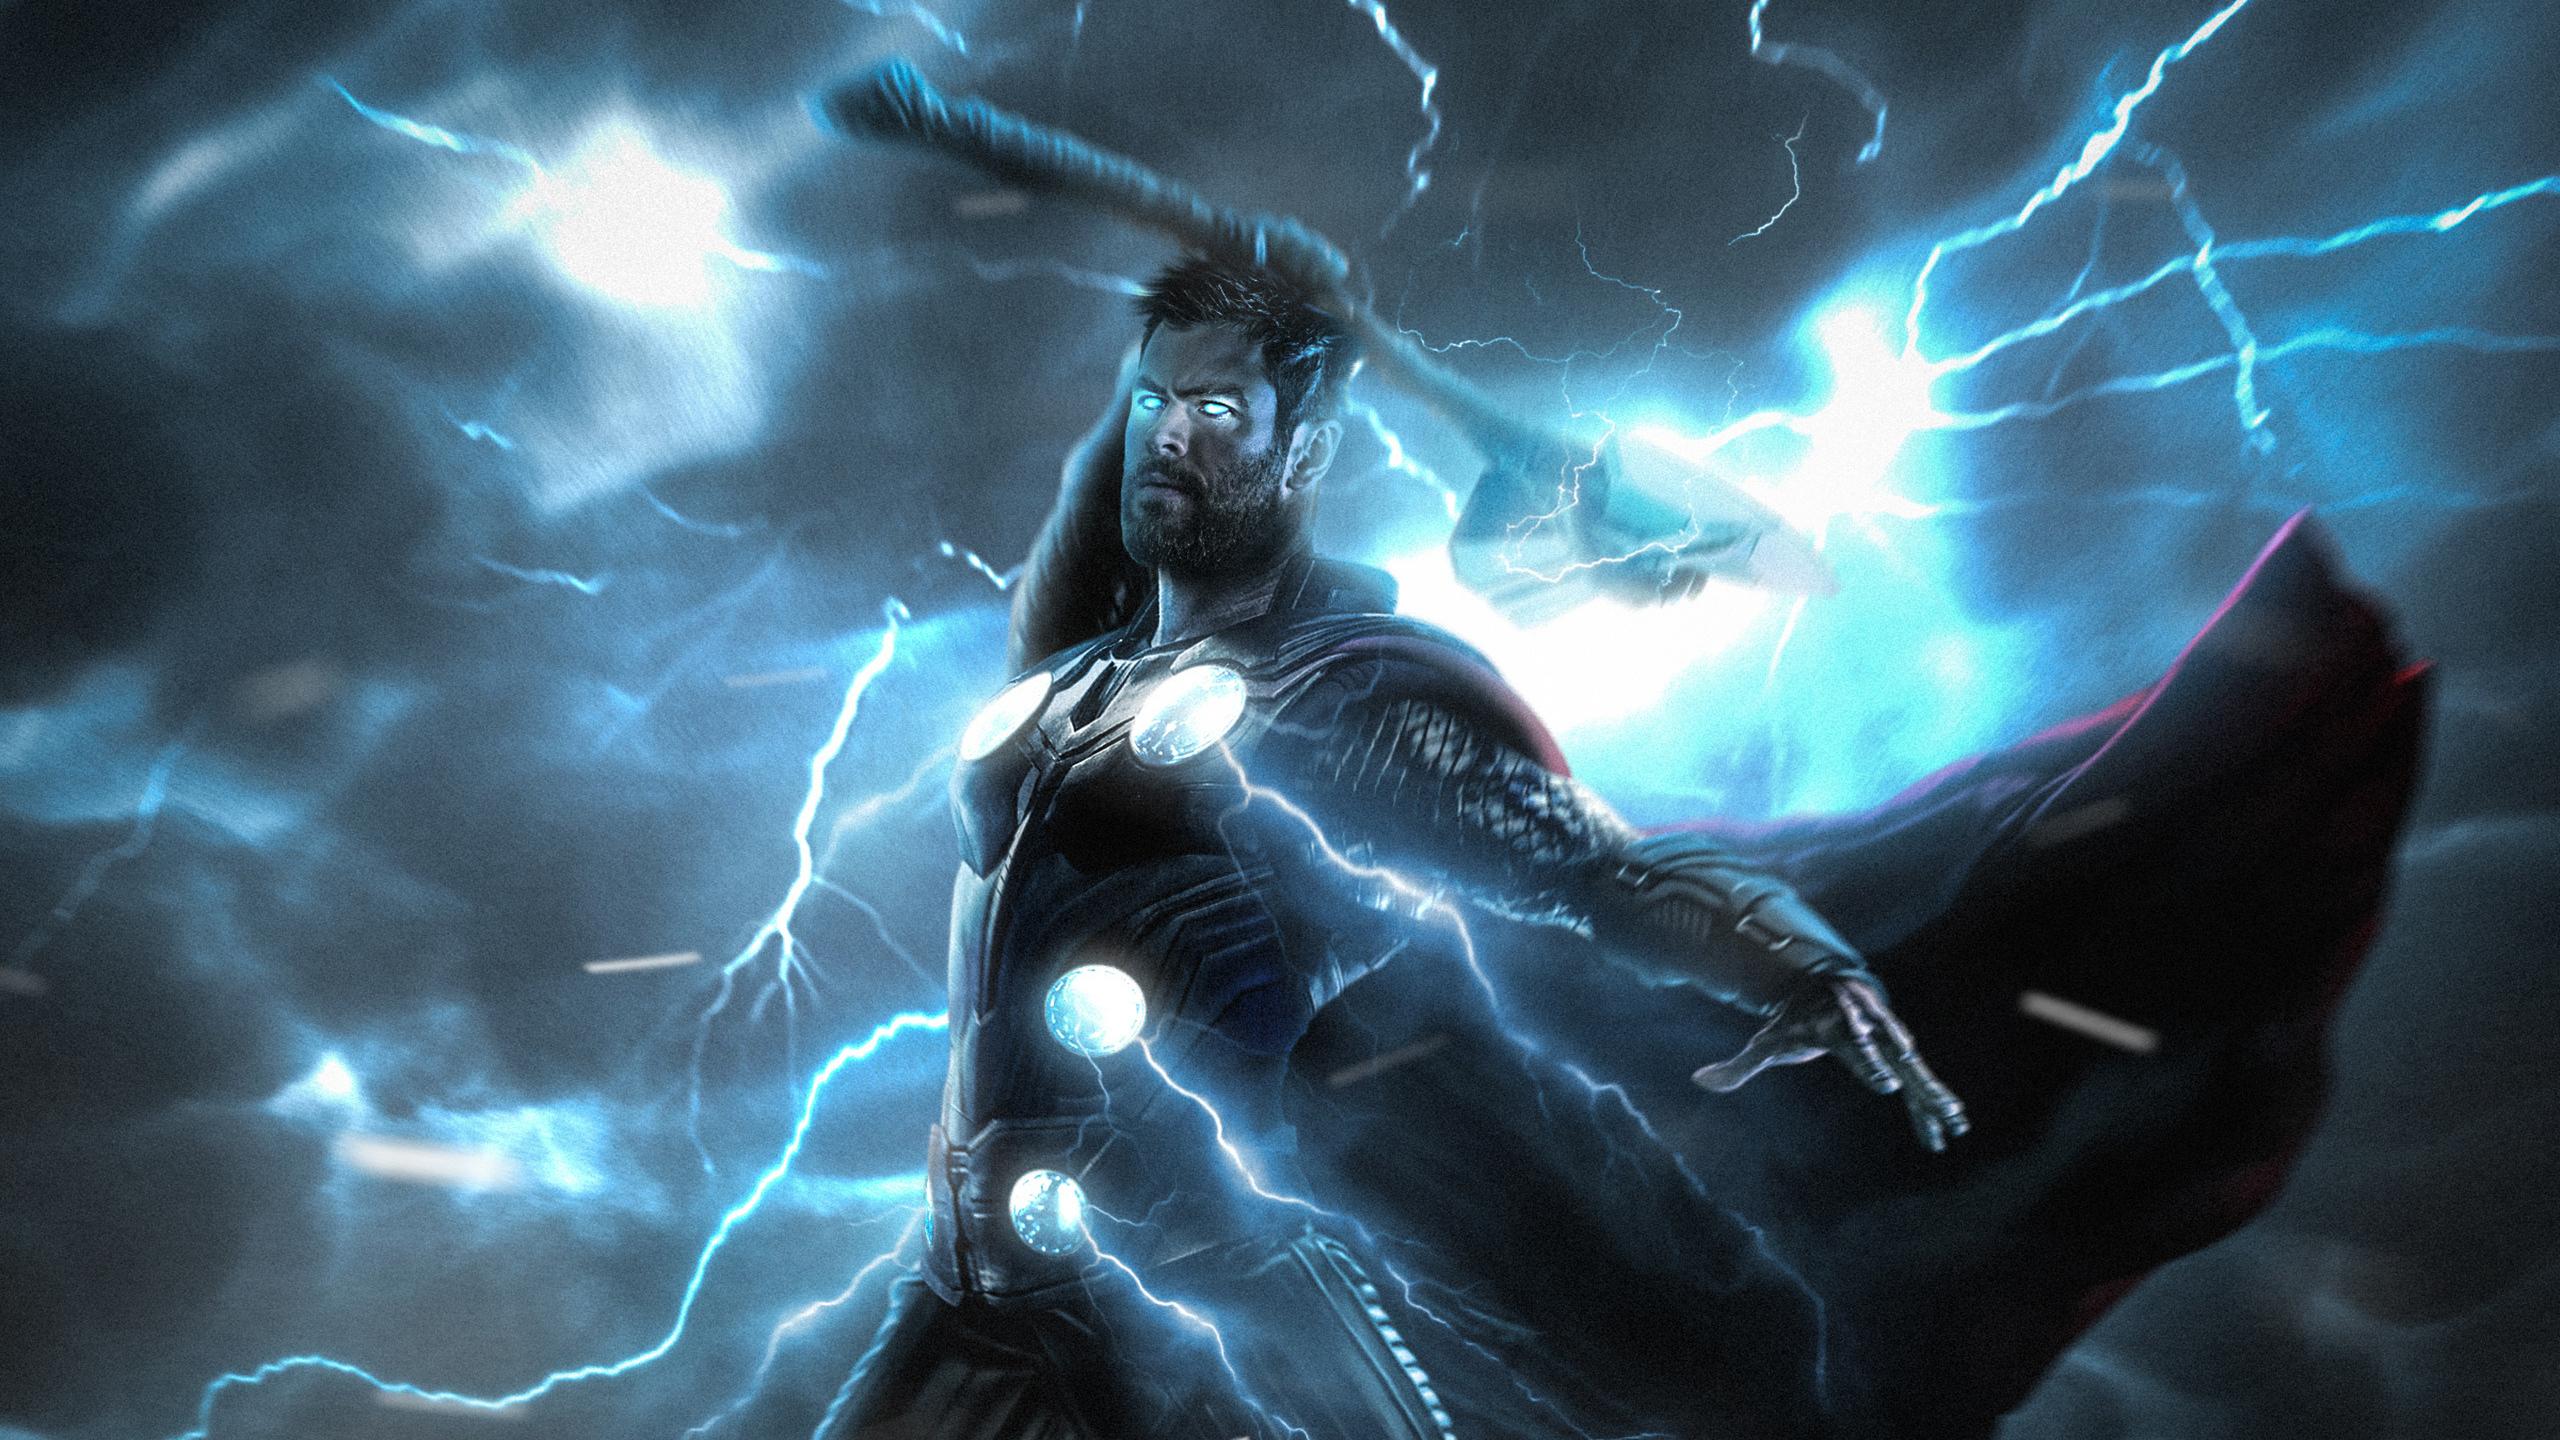 Download 2560x1440 Wallpaper Thor Lightning Strike Superhero Dual Wide Widescreen 16 9 Widescreen 2560x1440 Hd Image Background 15295